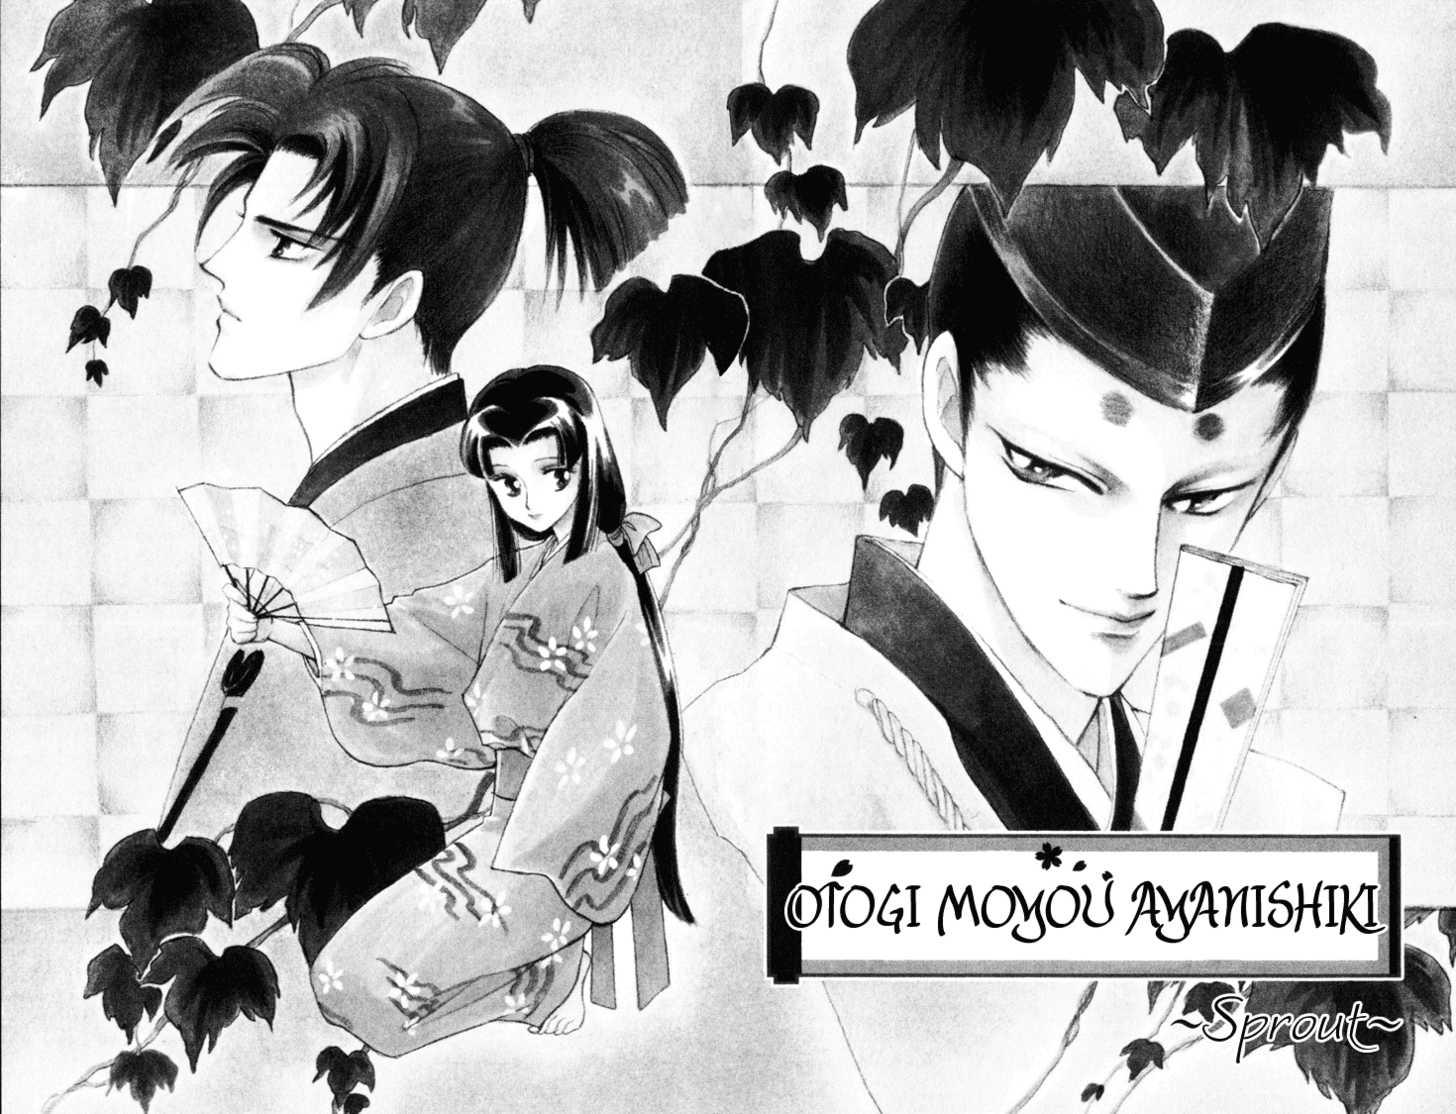 Otogi Moyou Ayanishiki 5 Page 2